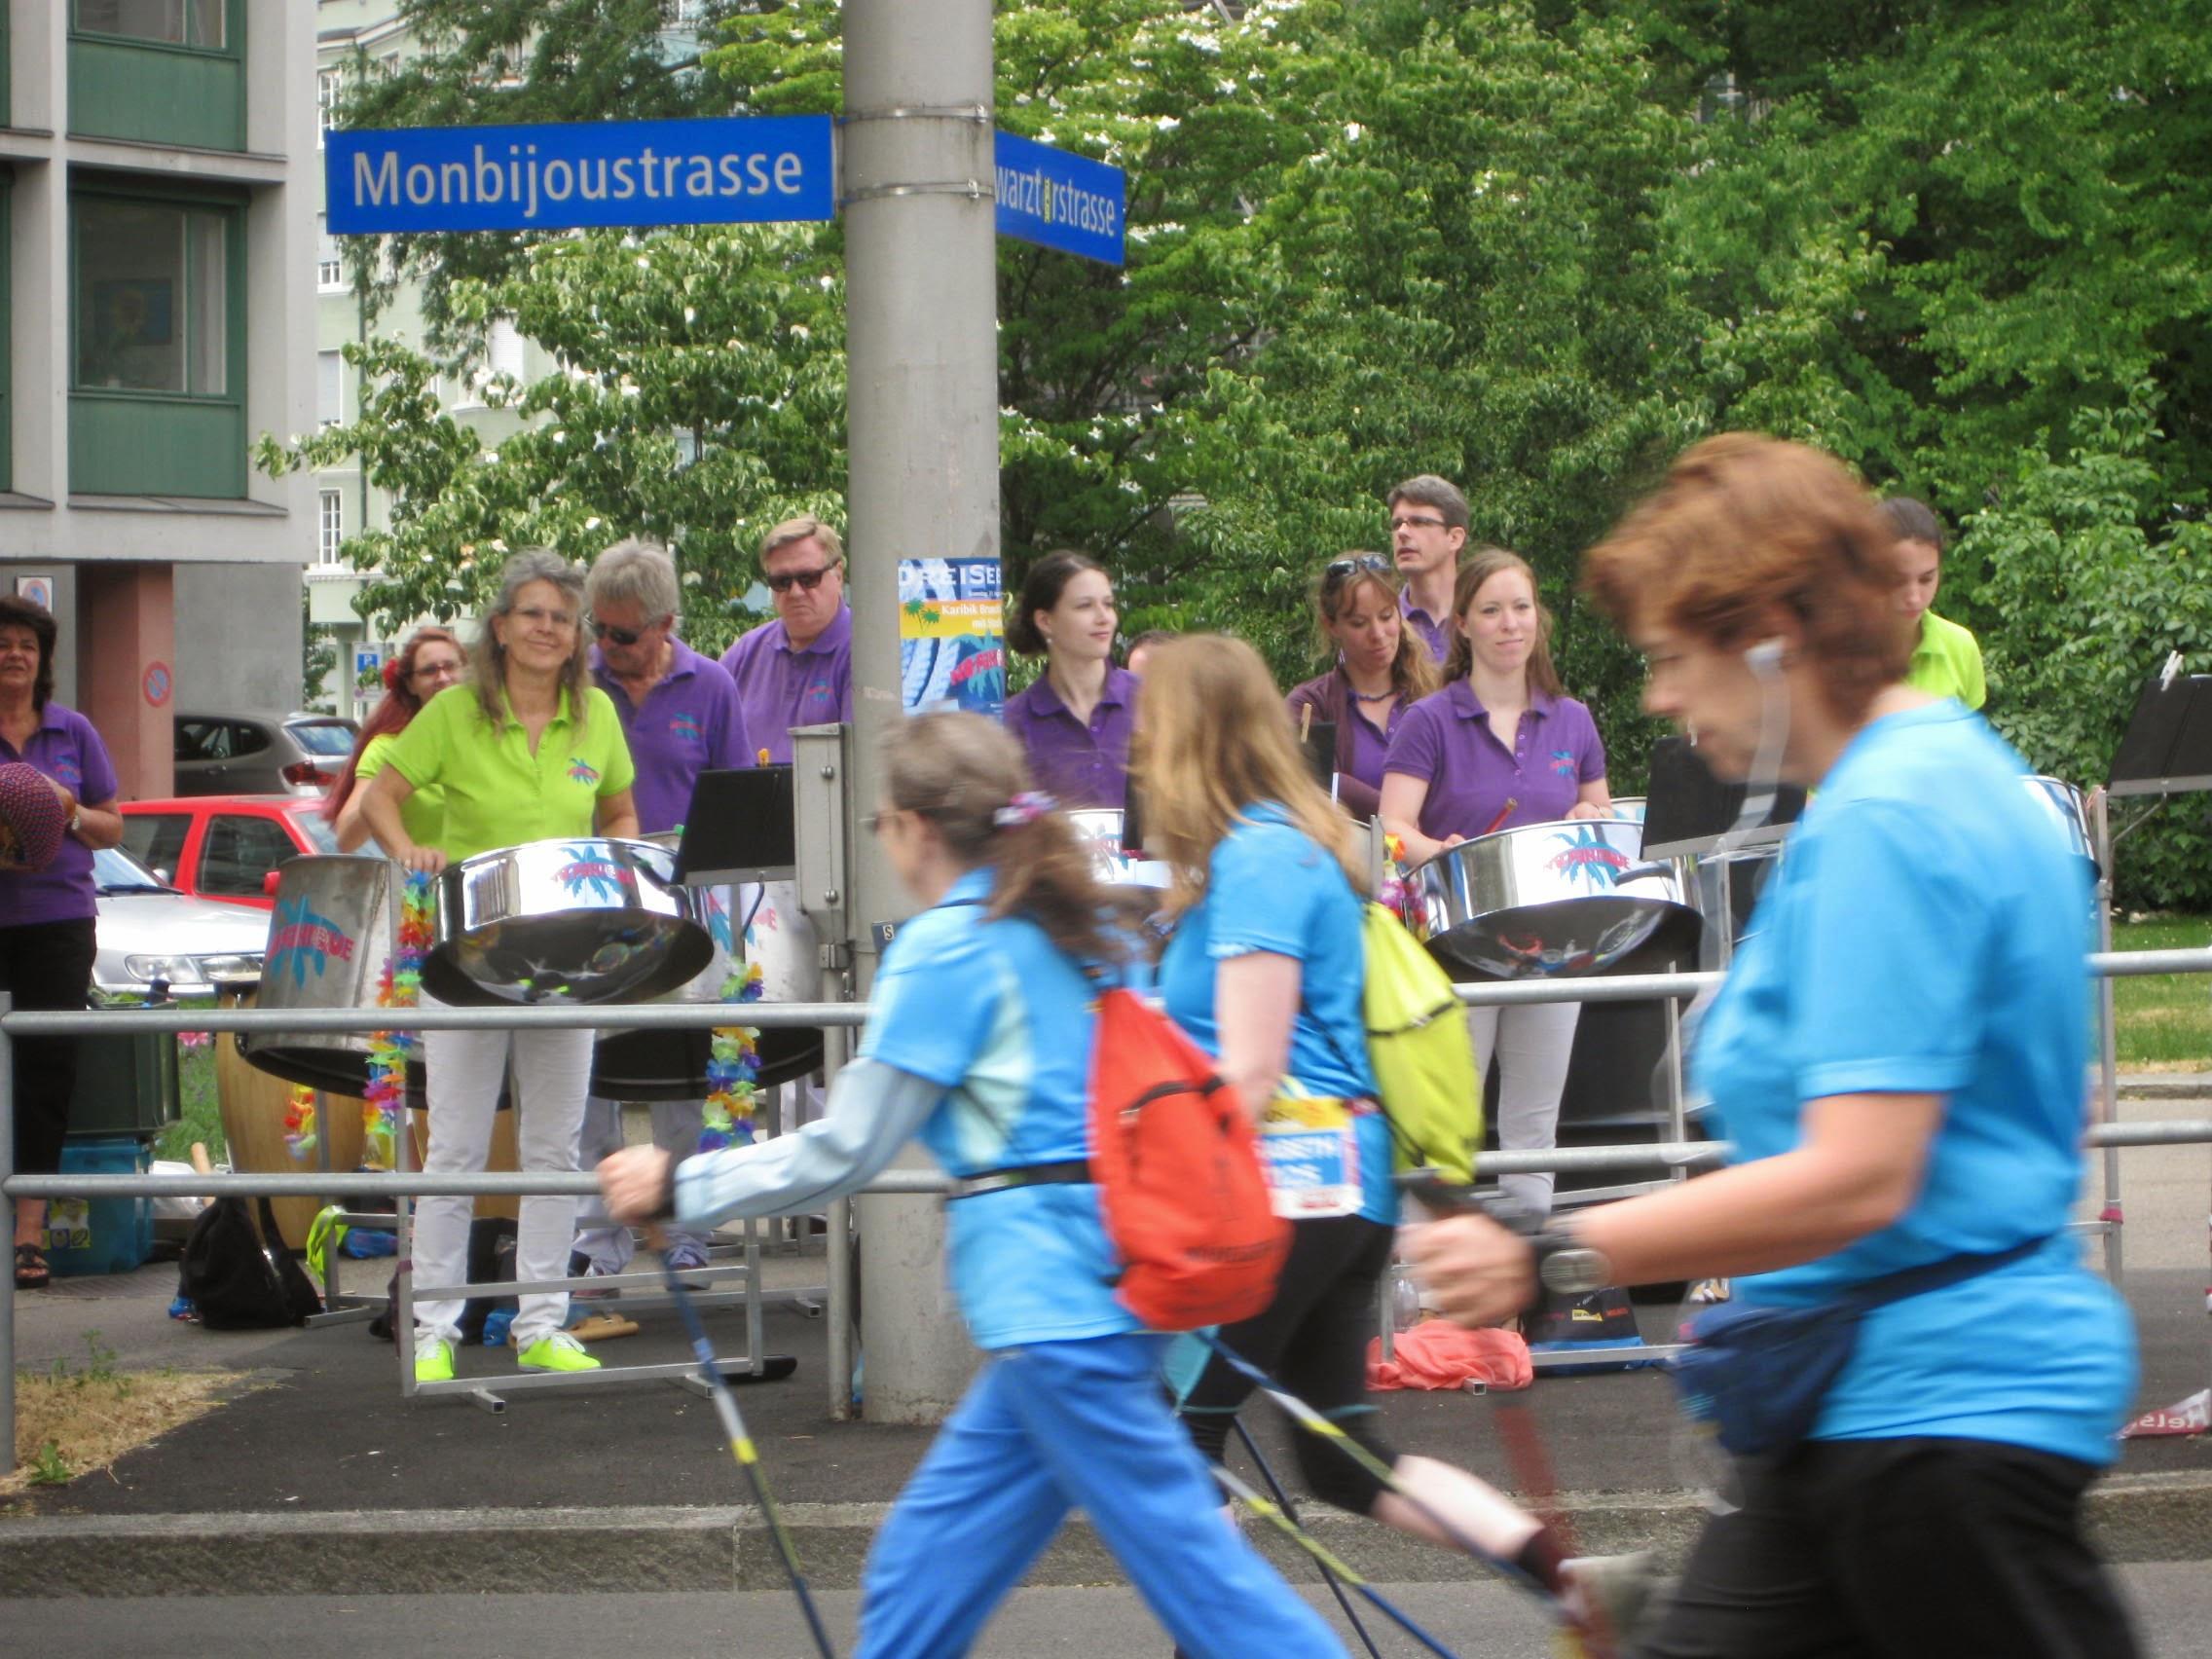 Frauenlauf am 15. Juni 2014 in Bern